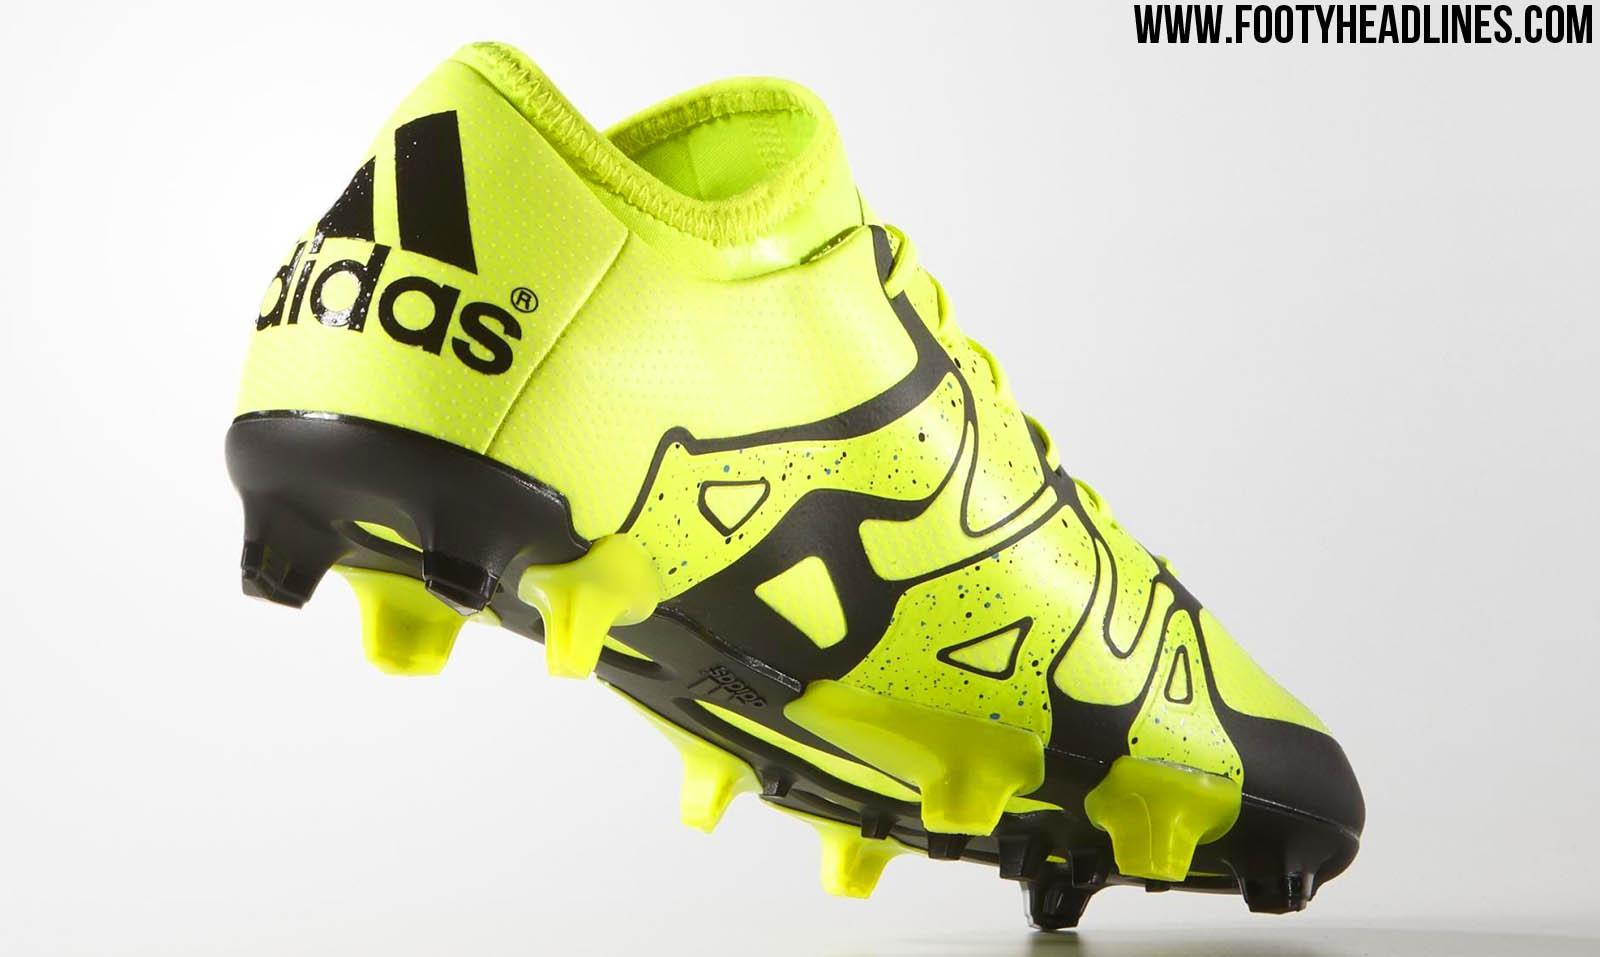 39c633bd9 ... new adidas football shoes 2015